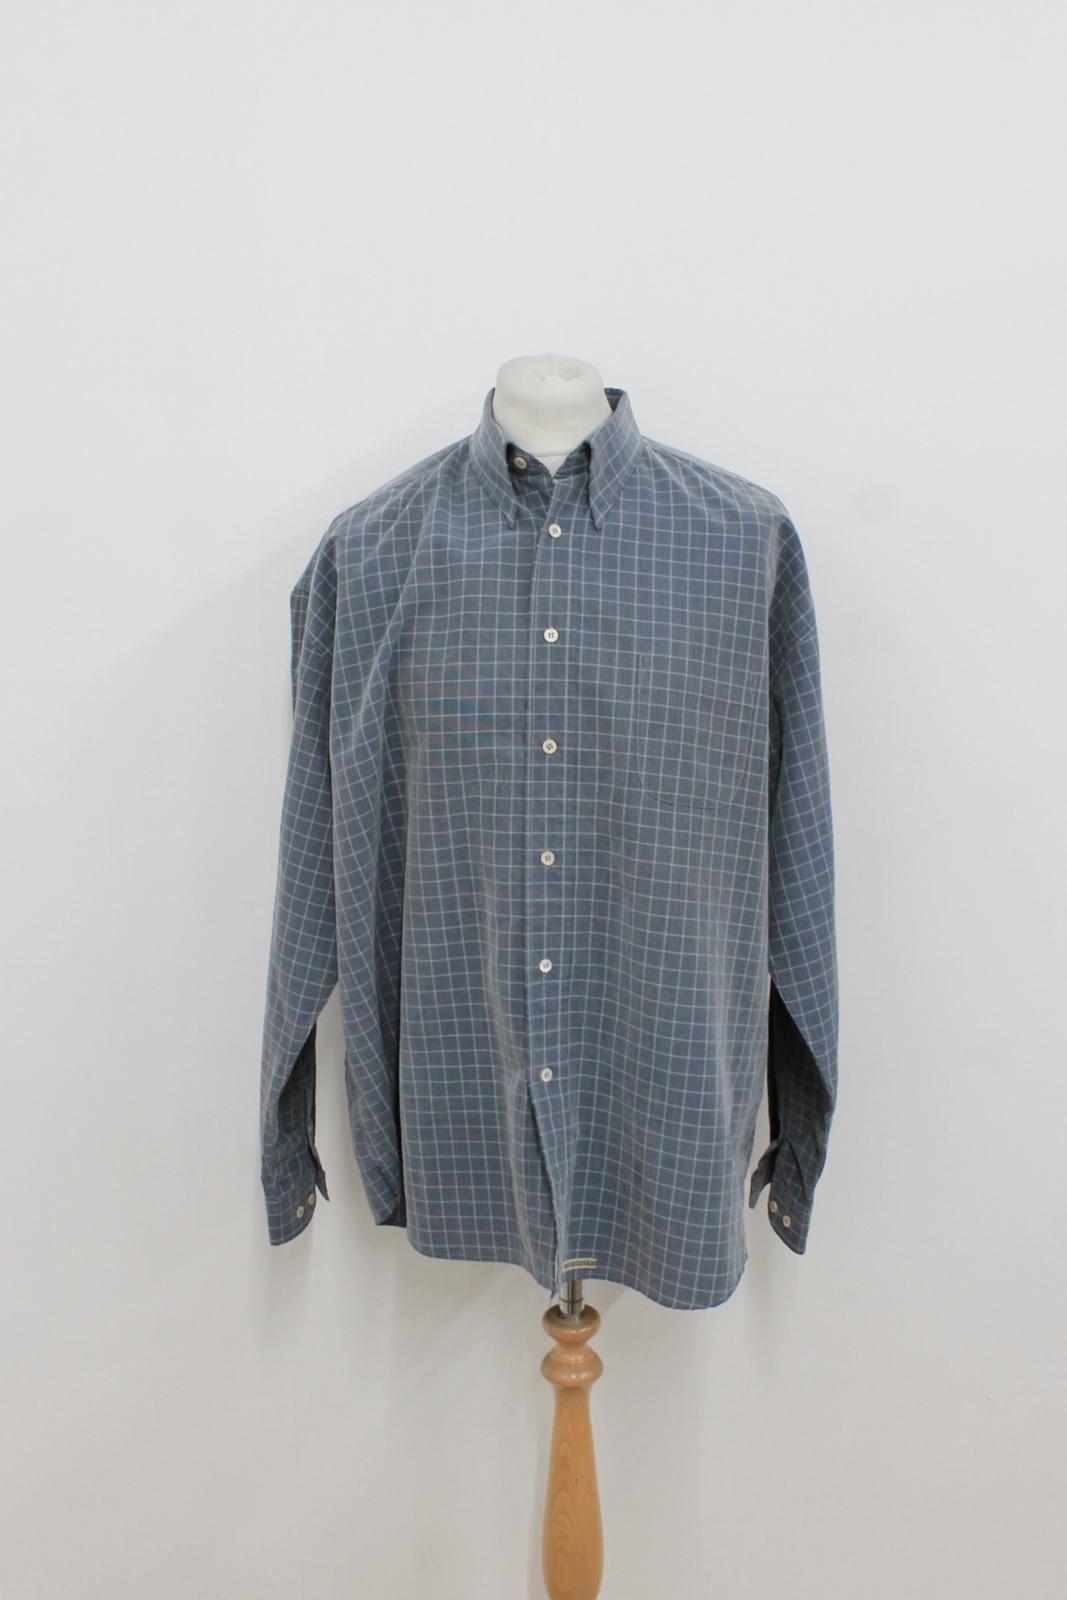 Ted-Baker-Herren-blau-grau-kariert-gemustert-Langarm-Freizeithemd-Groesse-5-xl